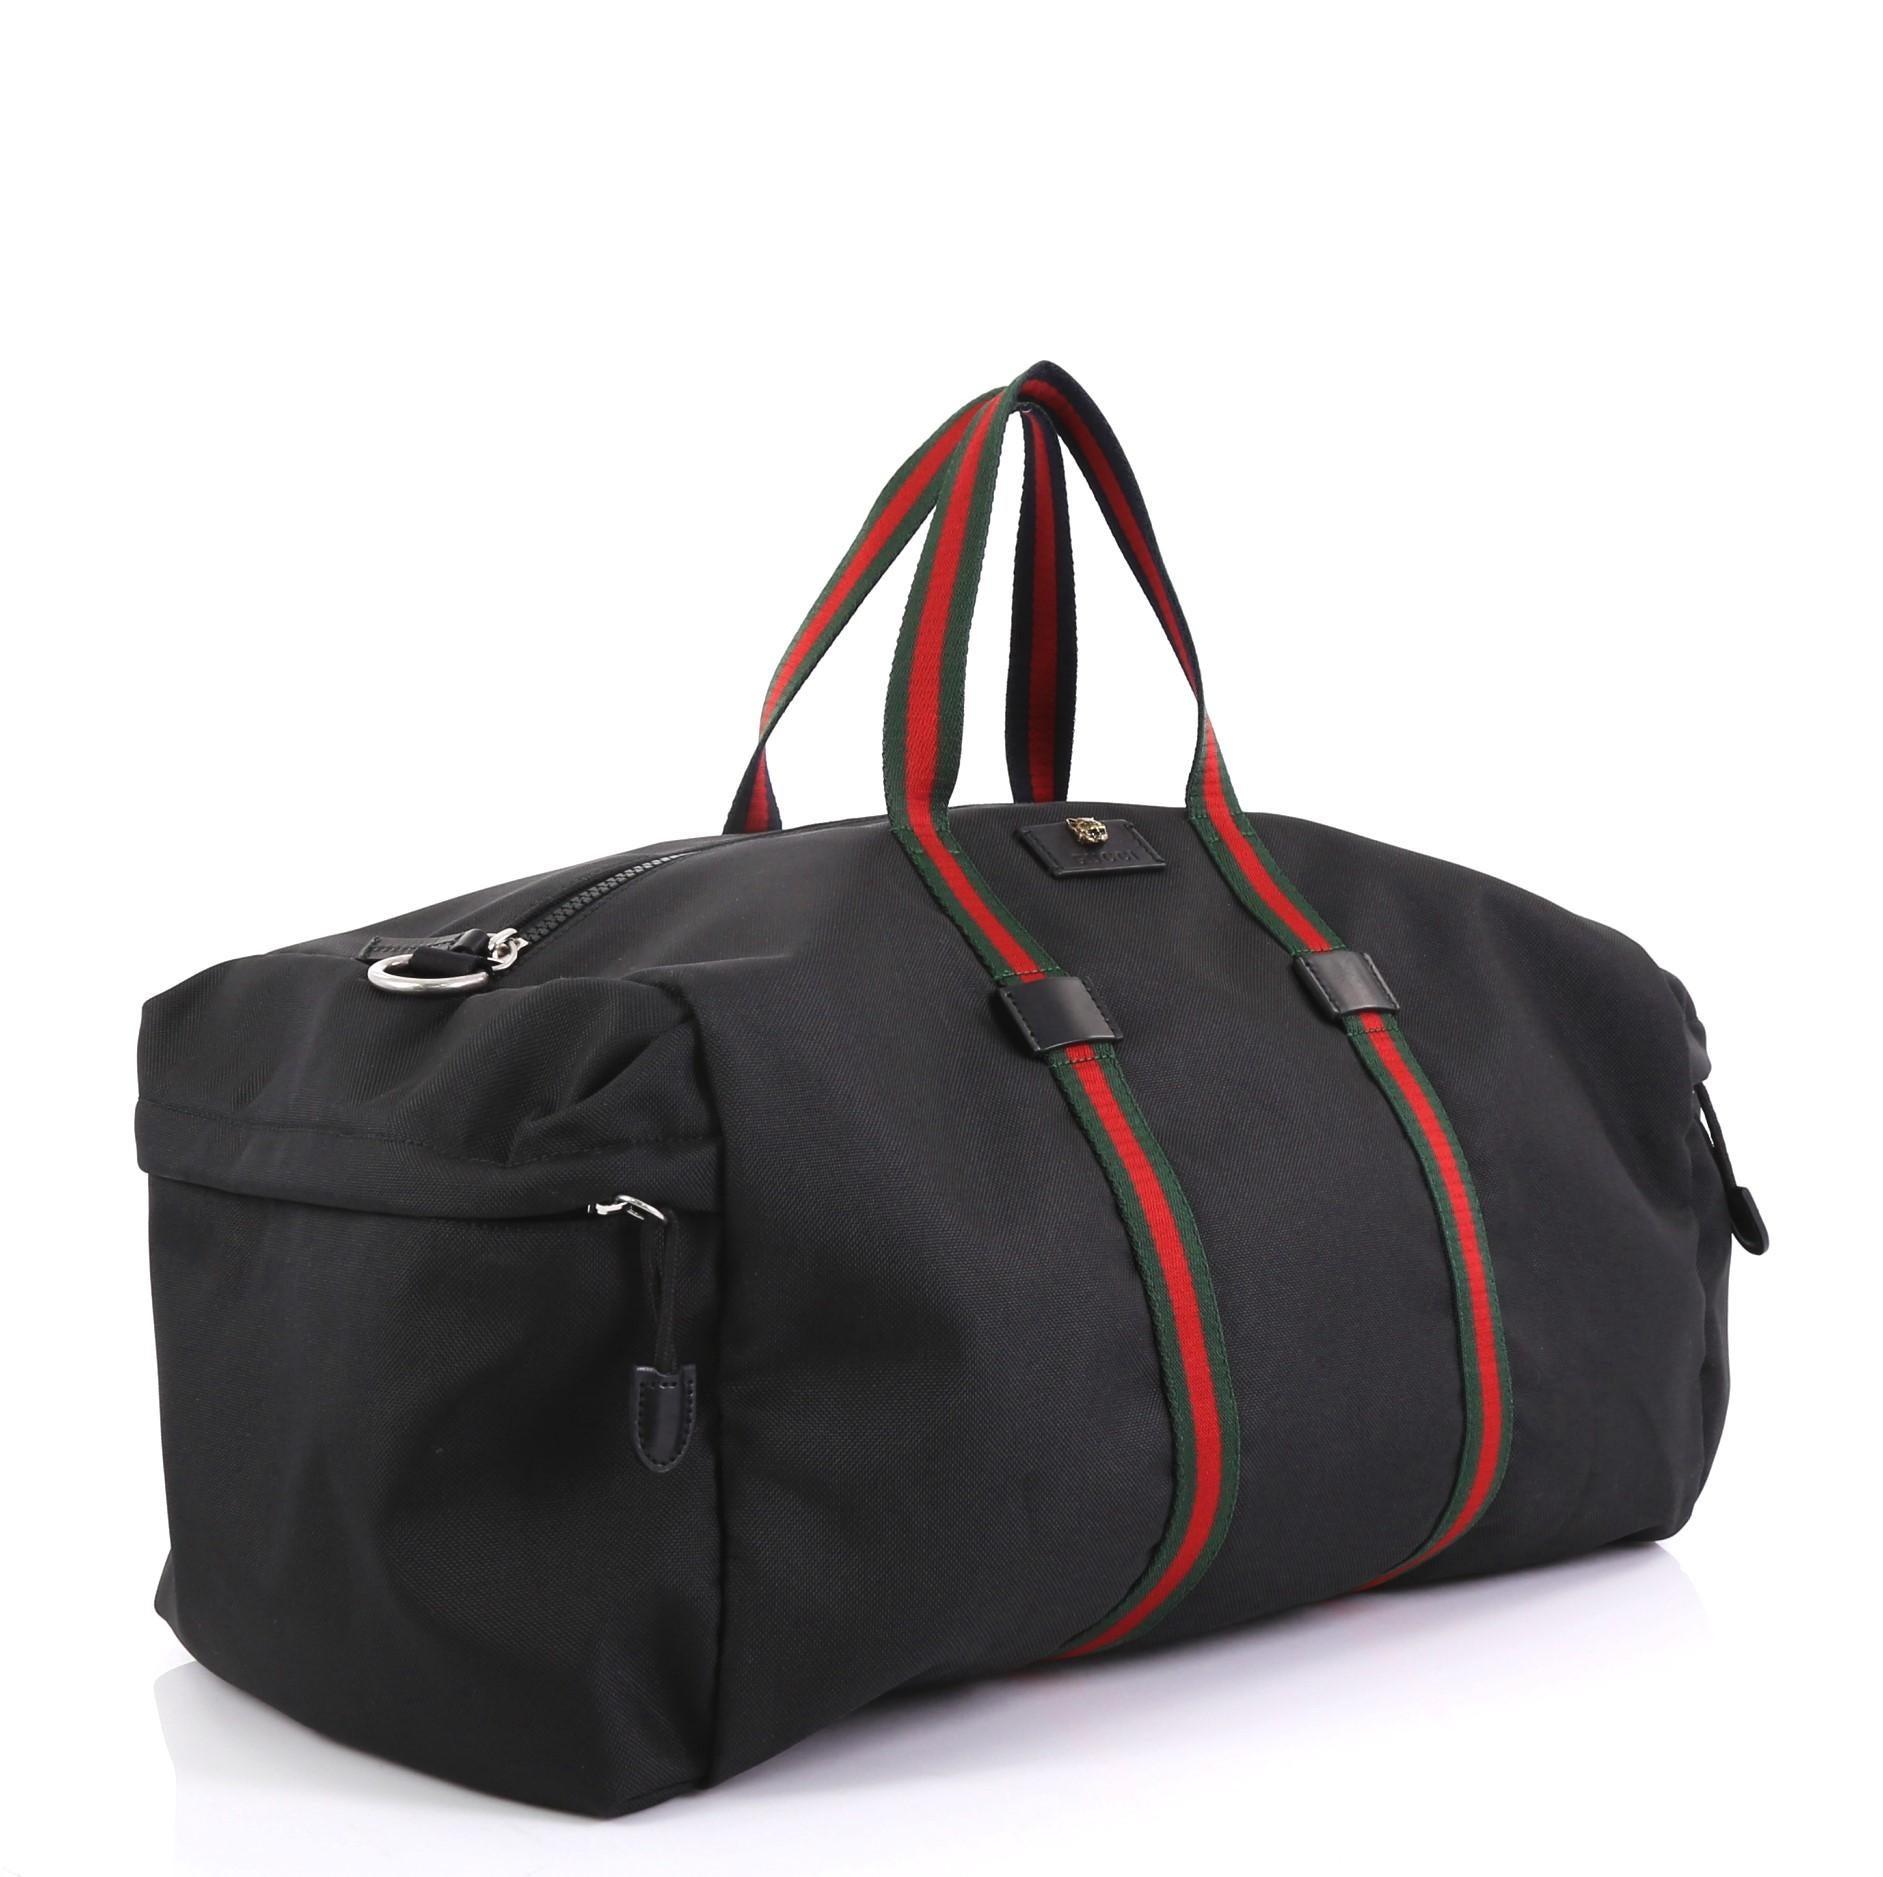 11601c137 Gucci Animalier Web Duffle Bag Techno Canvas Large at 1stdibs